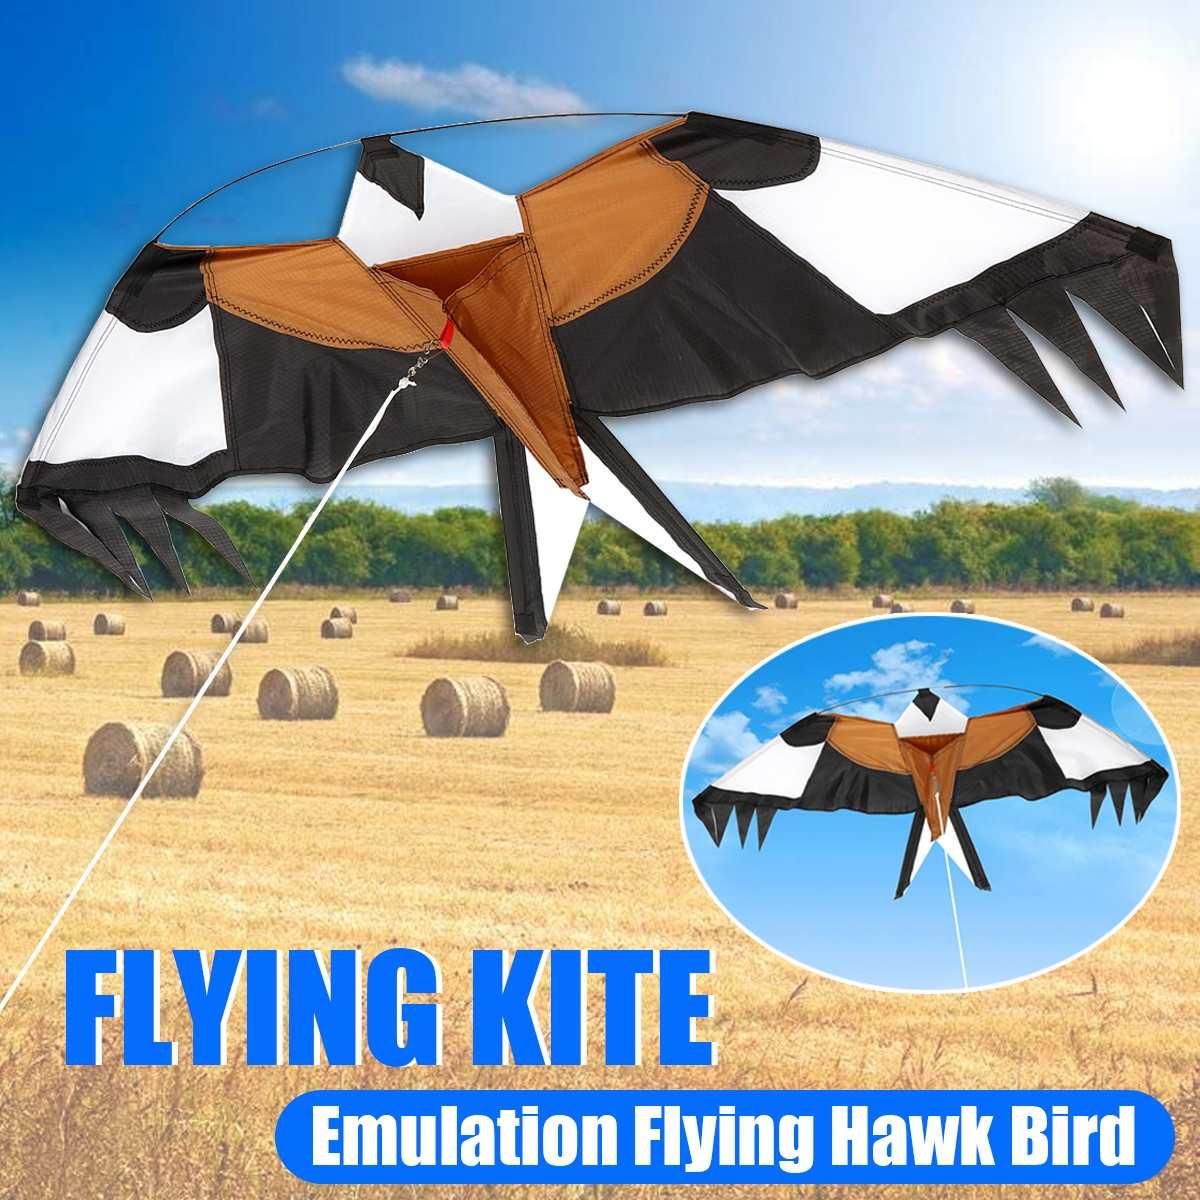 Emulation Outdoor Children Flying Bird Kites Windsock Toys Garden Toys 2m Flat Eagle Kite Big Fly Bird Kite For Kids